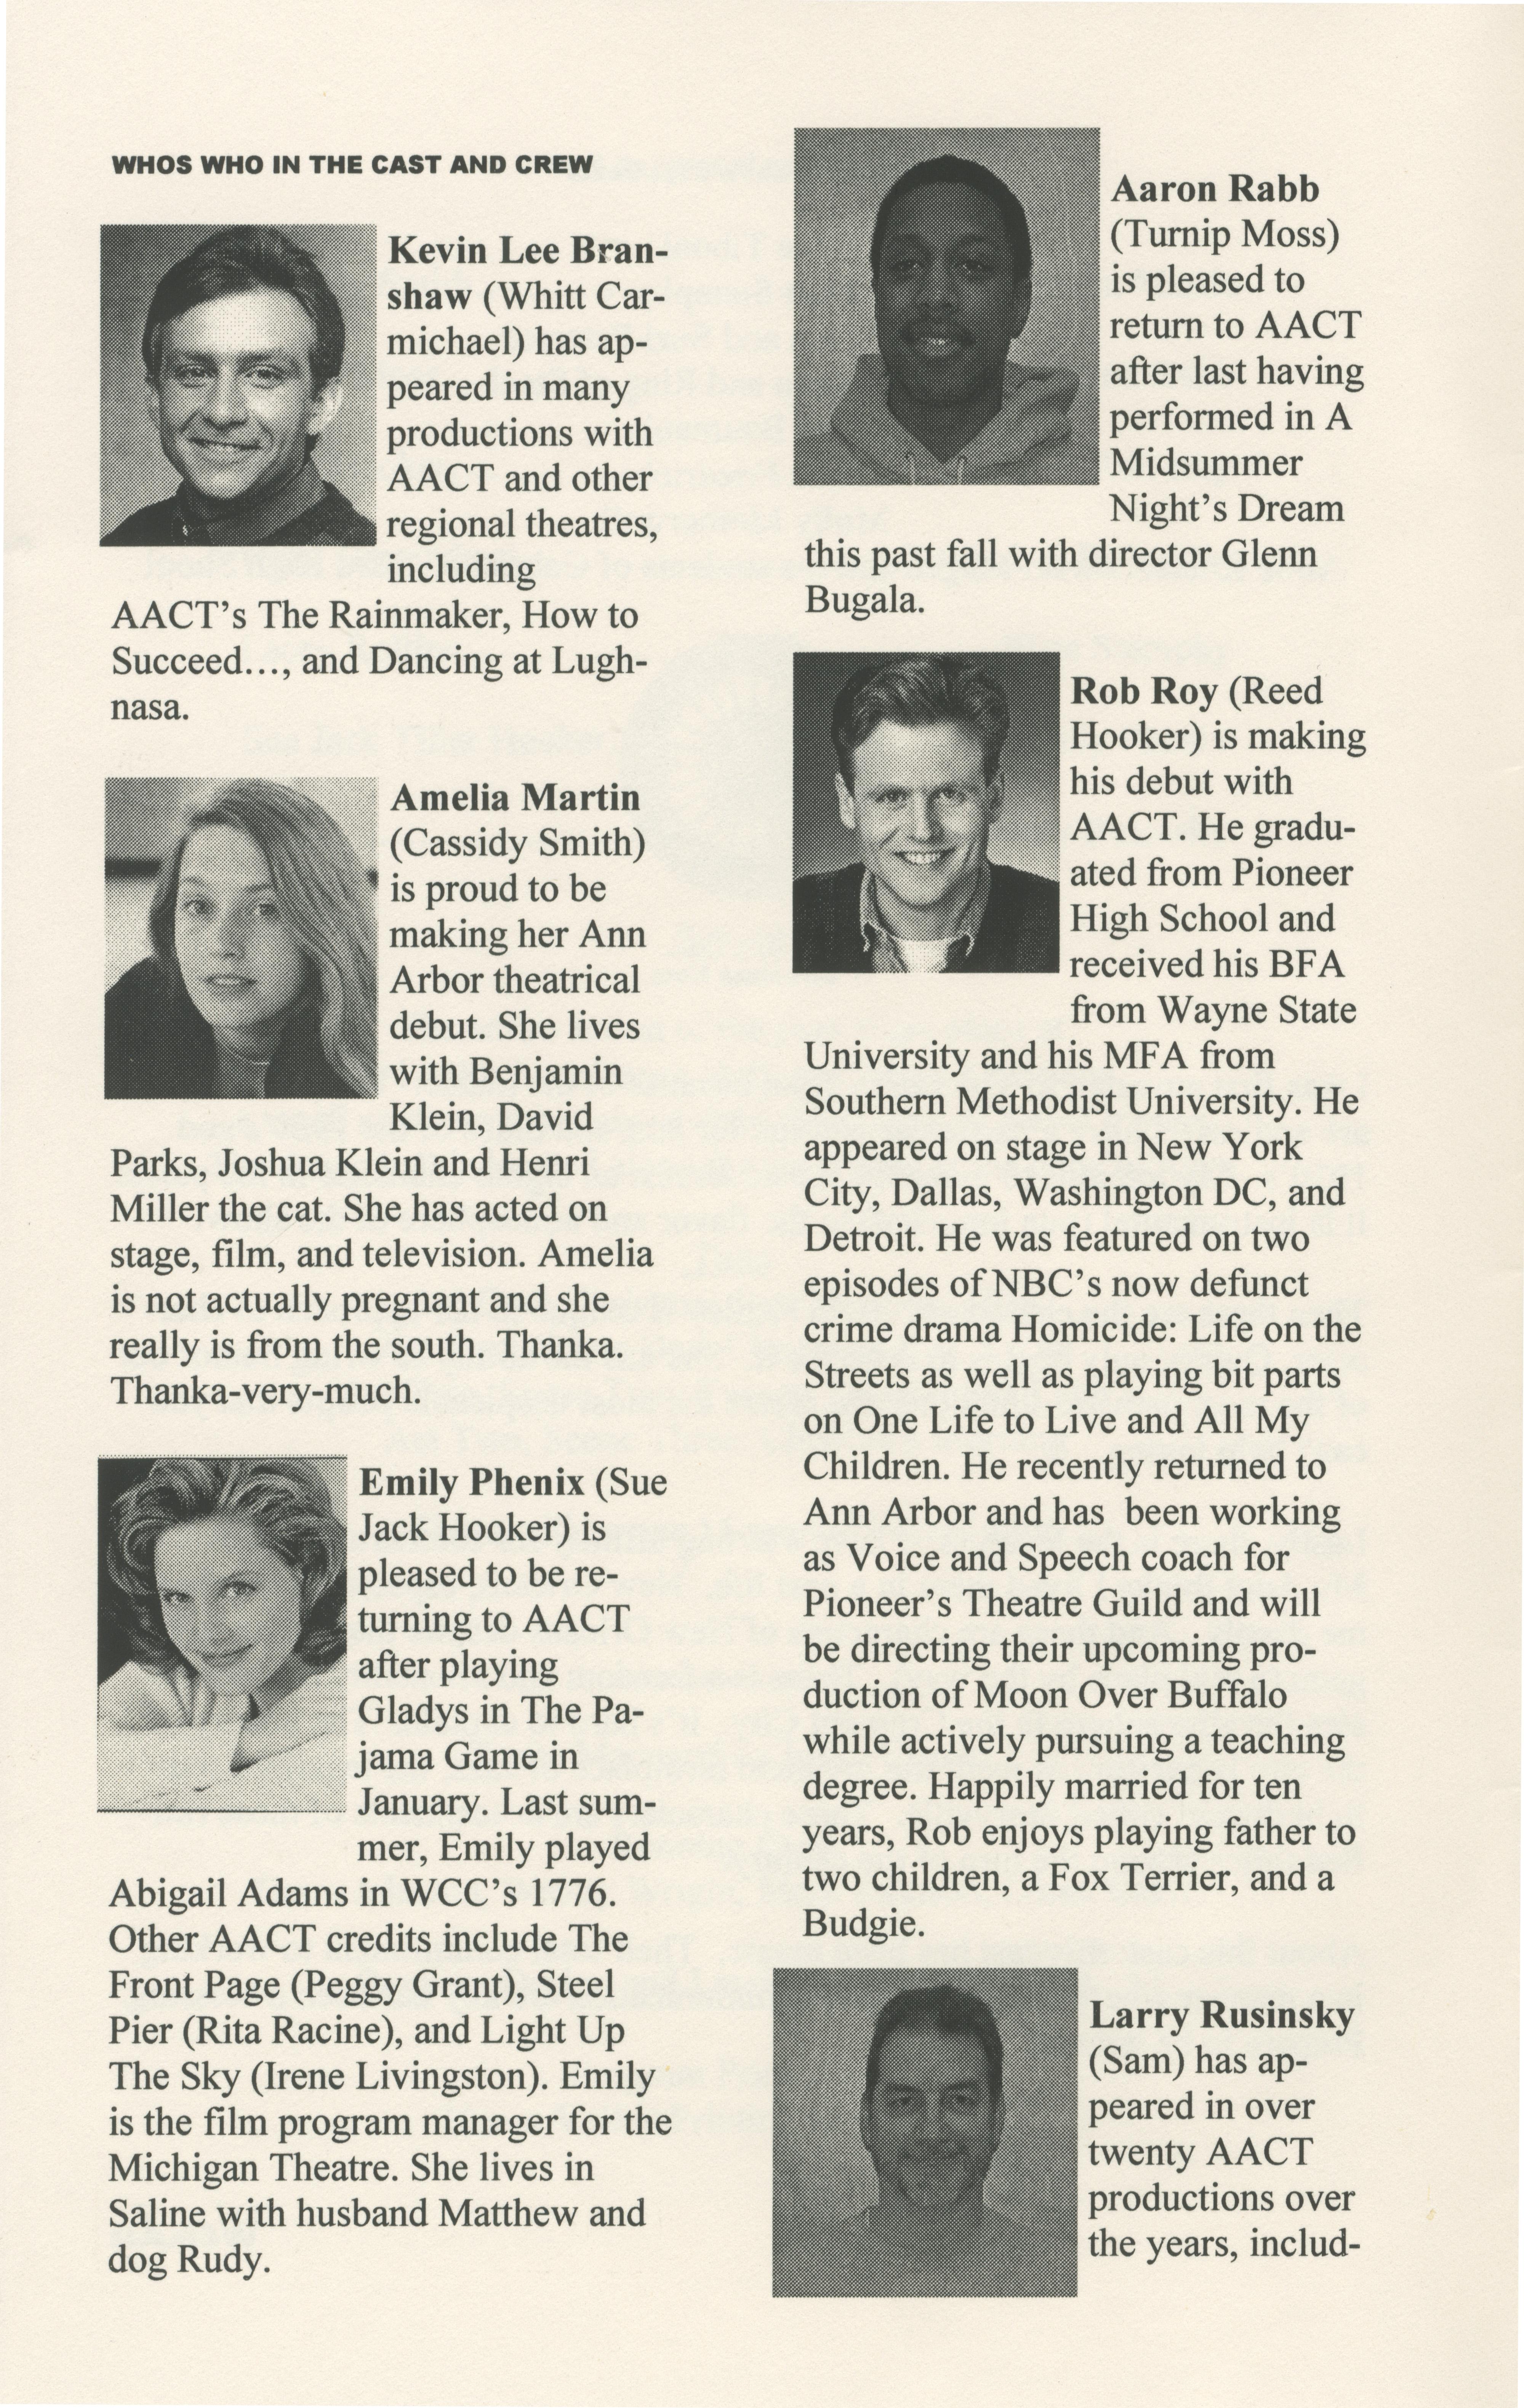 ann arbor civic theatre program the lucky spot march 14 2002